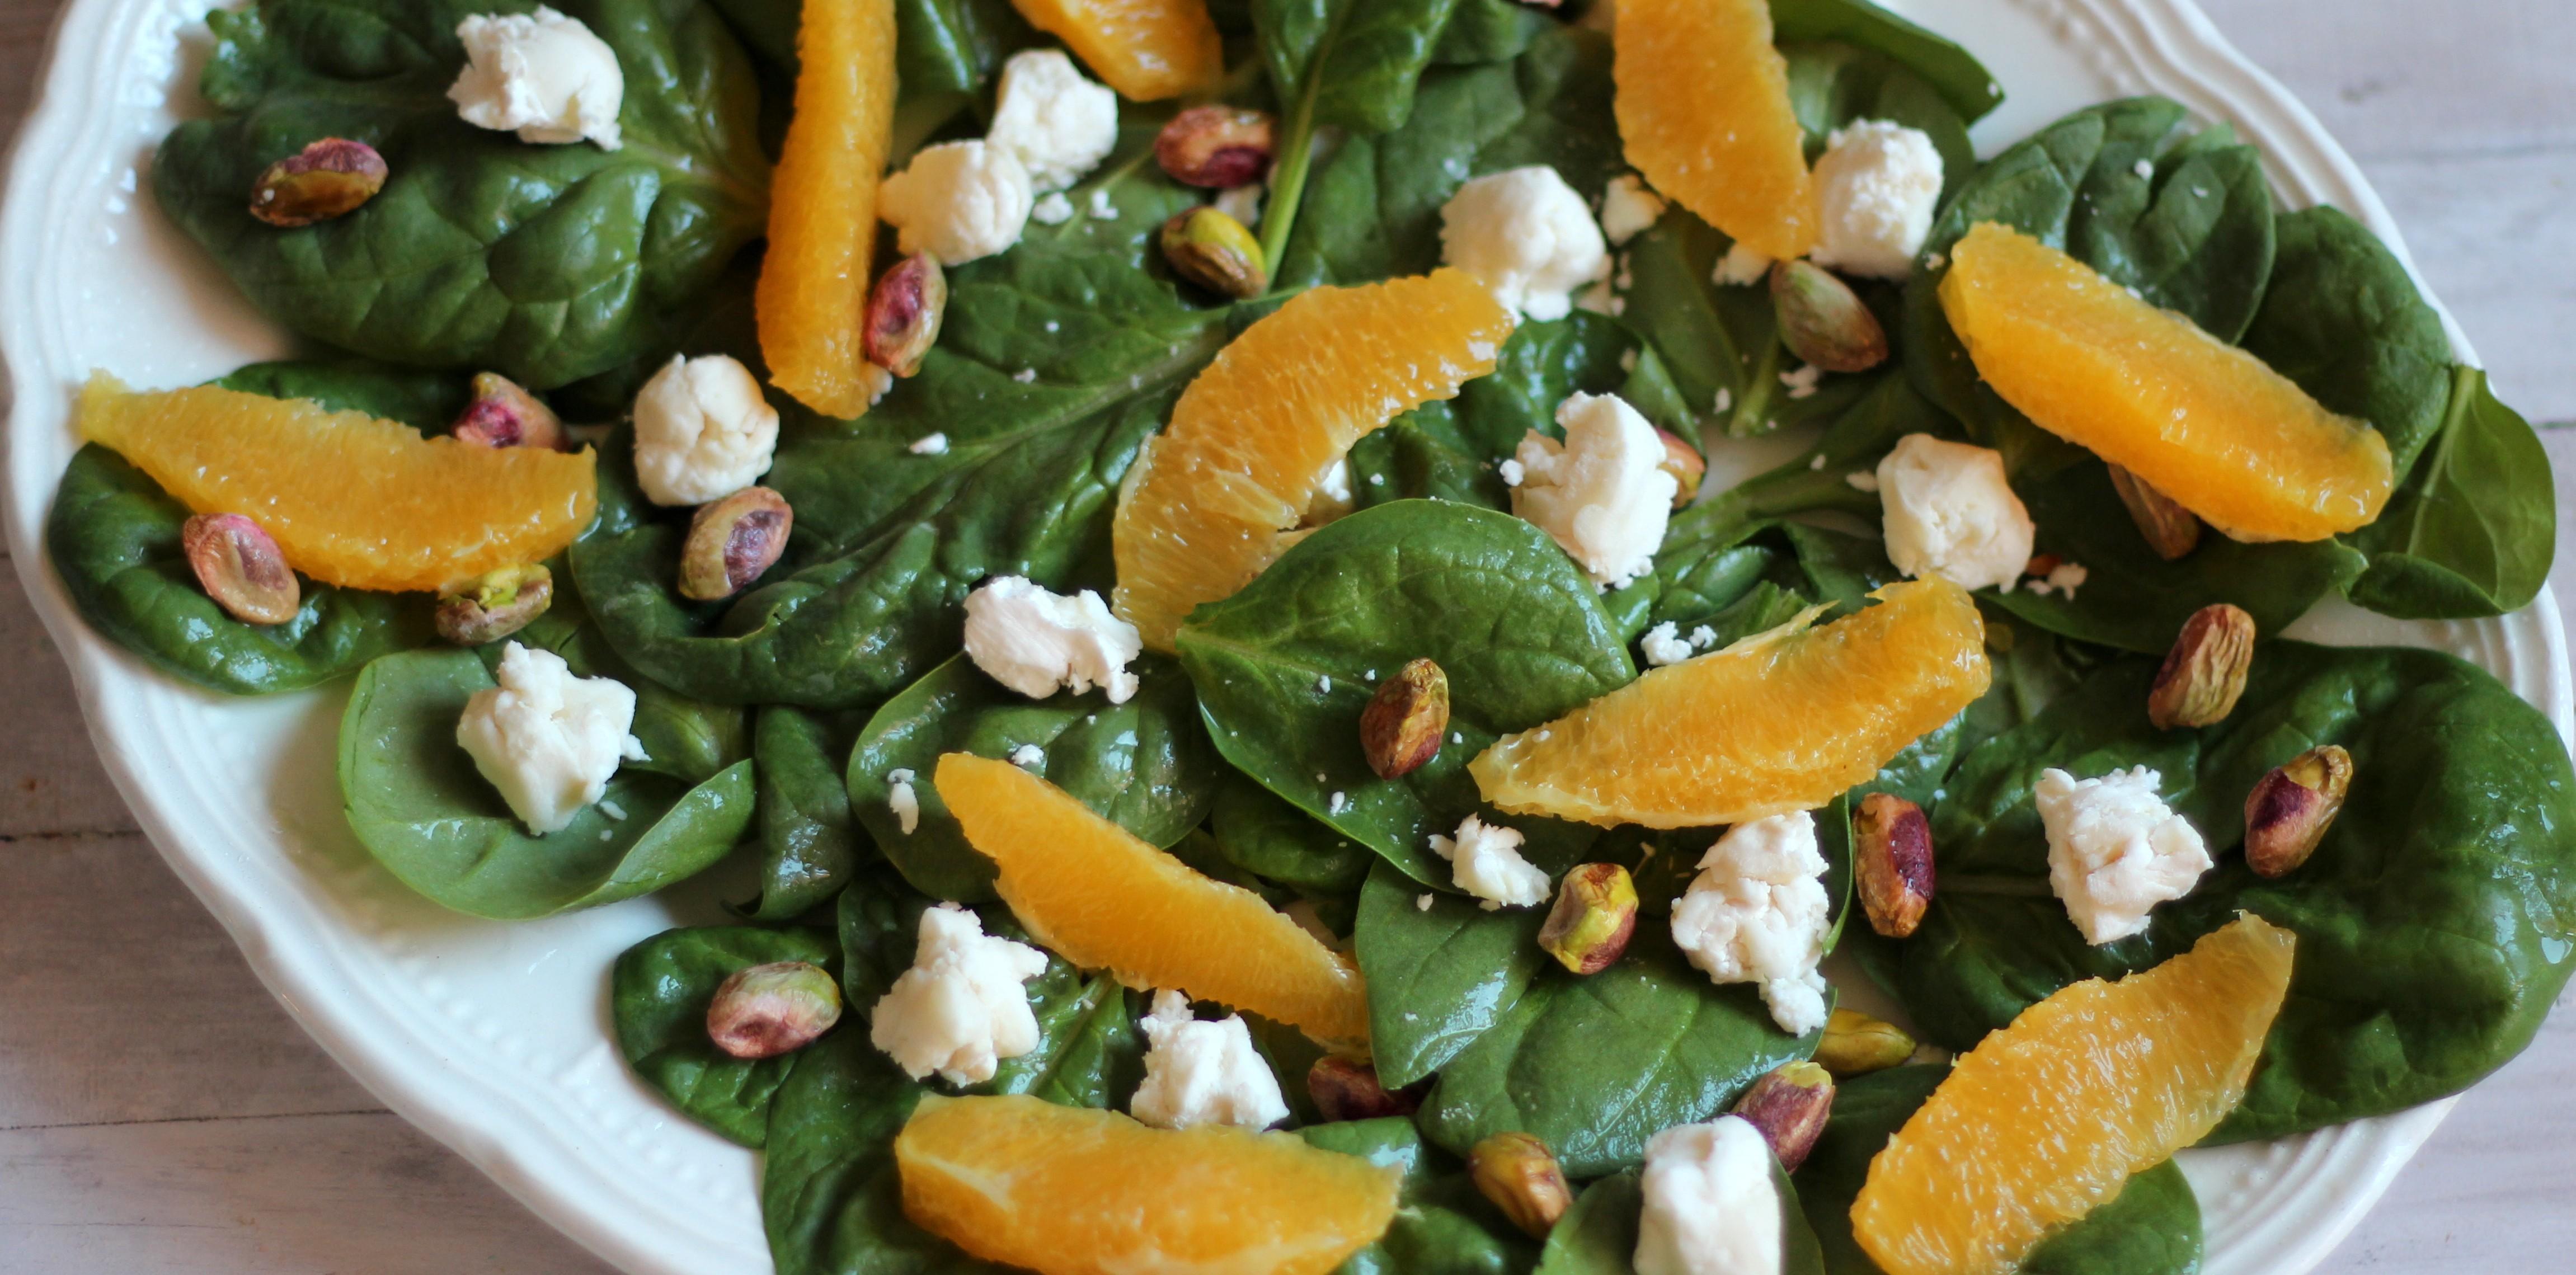 ensaladas verdes sencillas - photo #3